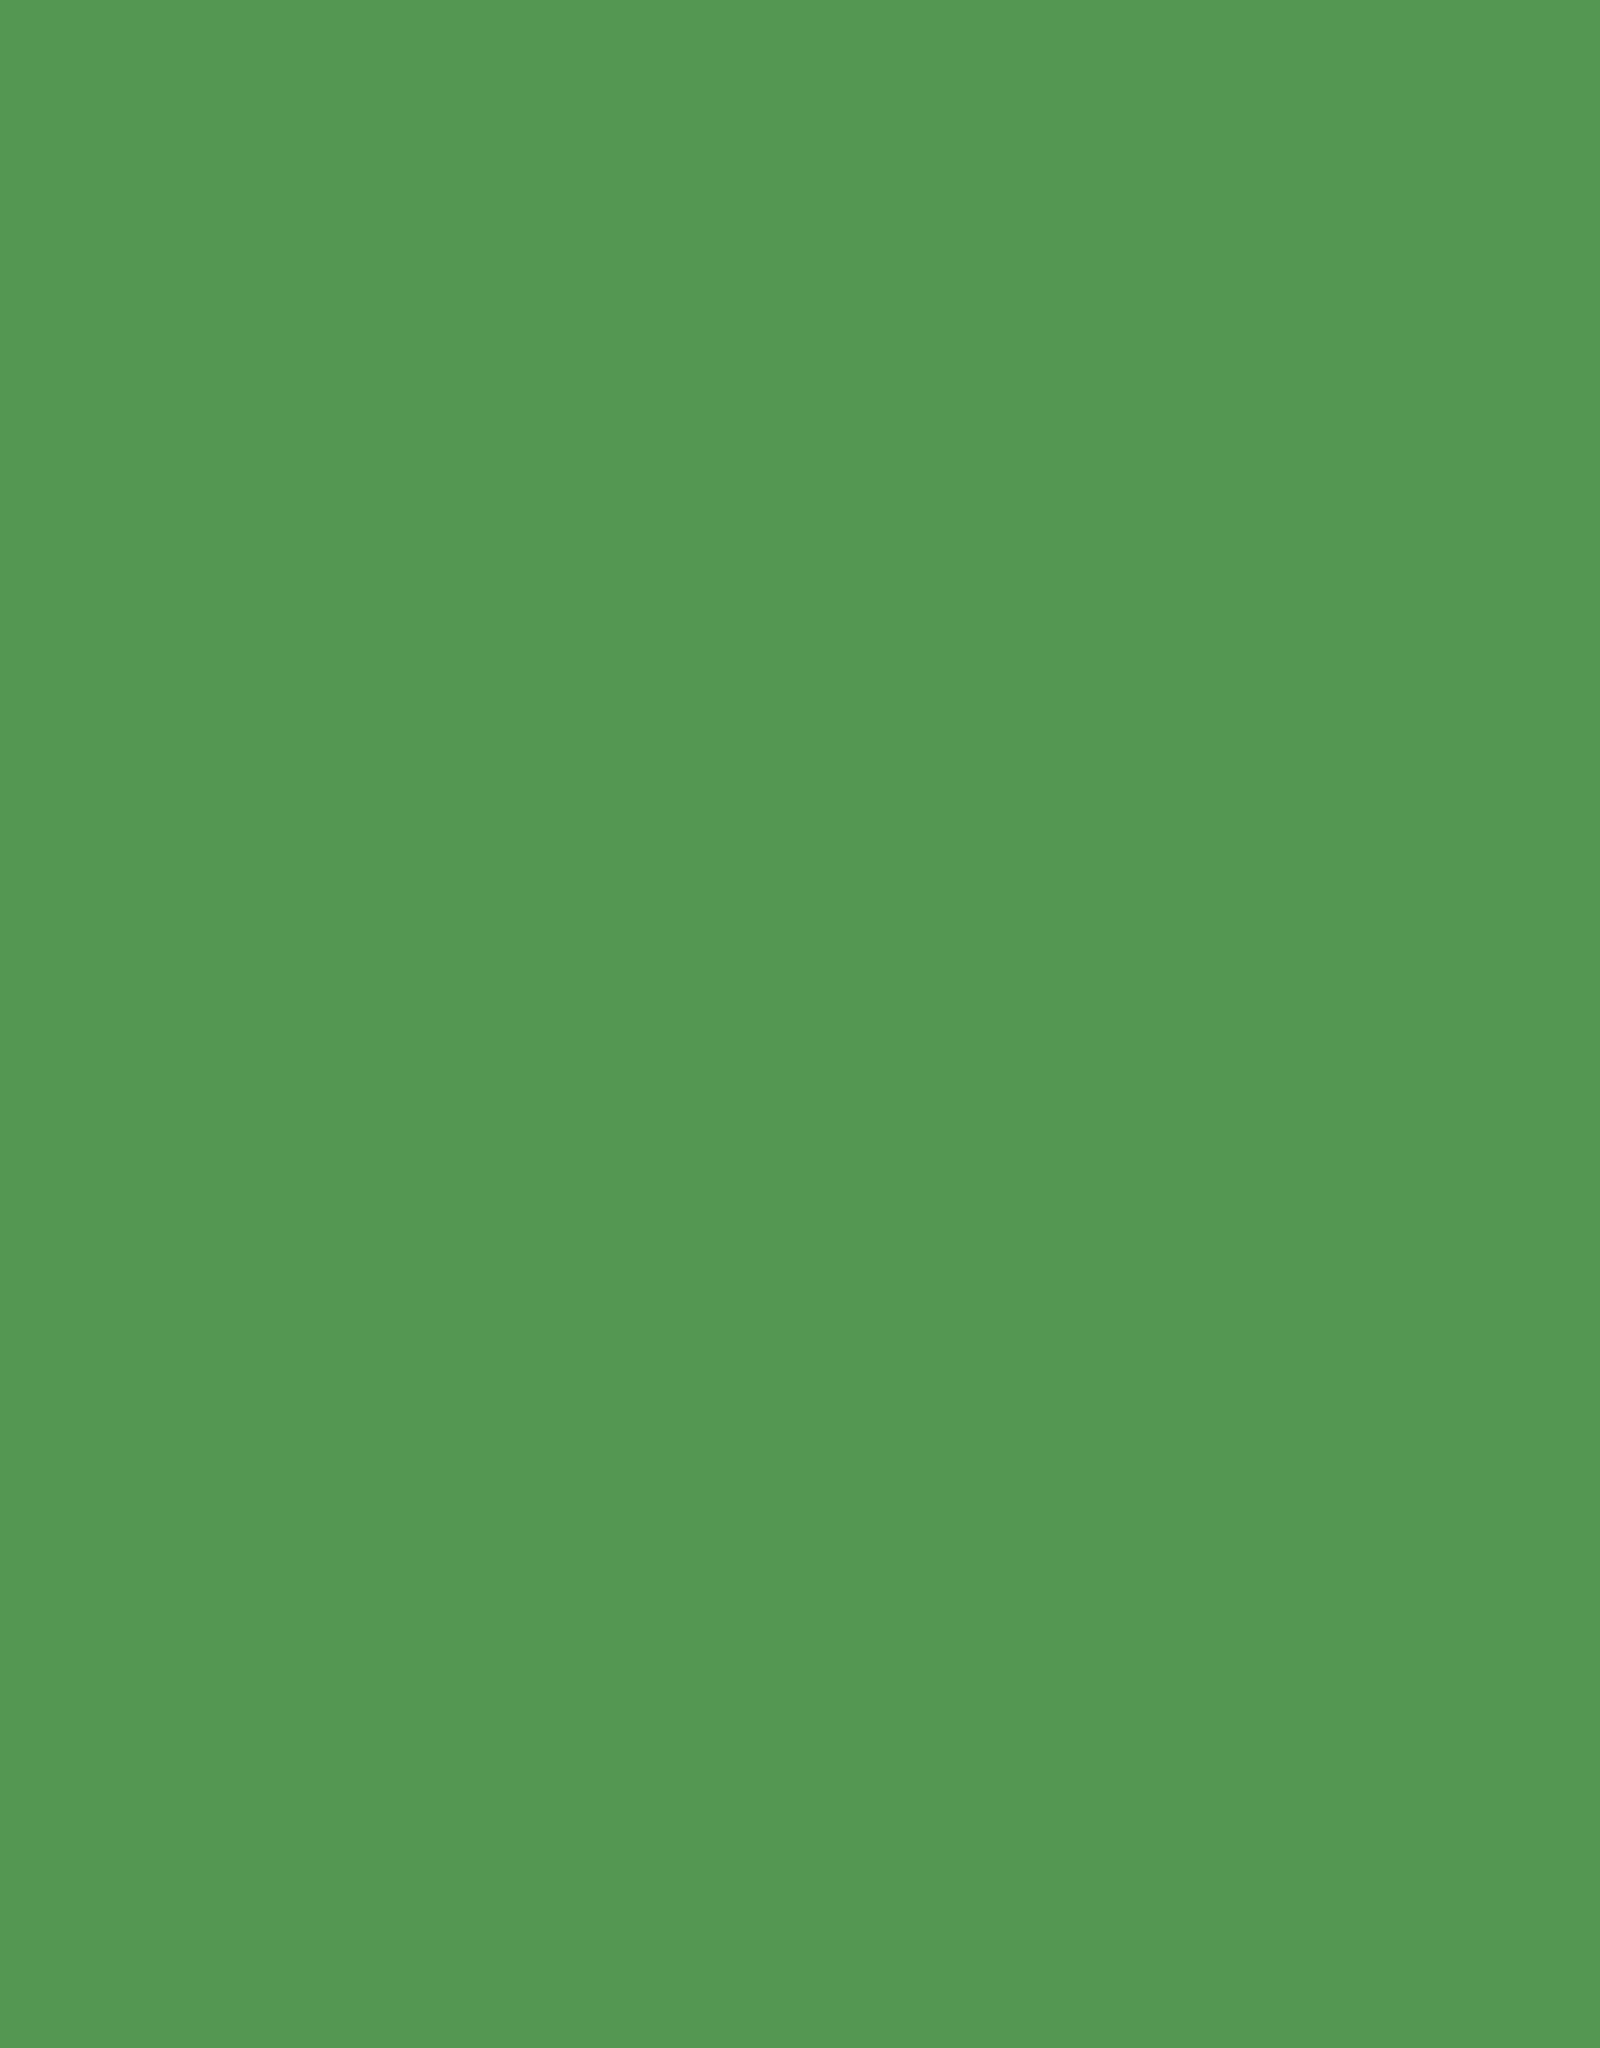 Superior Seamless Superior Seamless Stinger #54 (chroma key compatible)